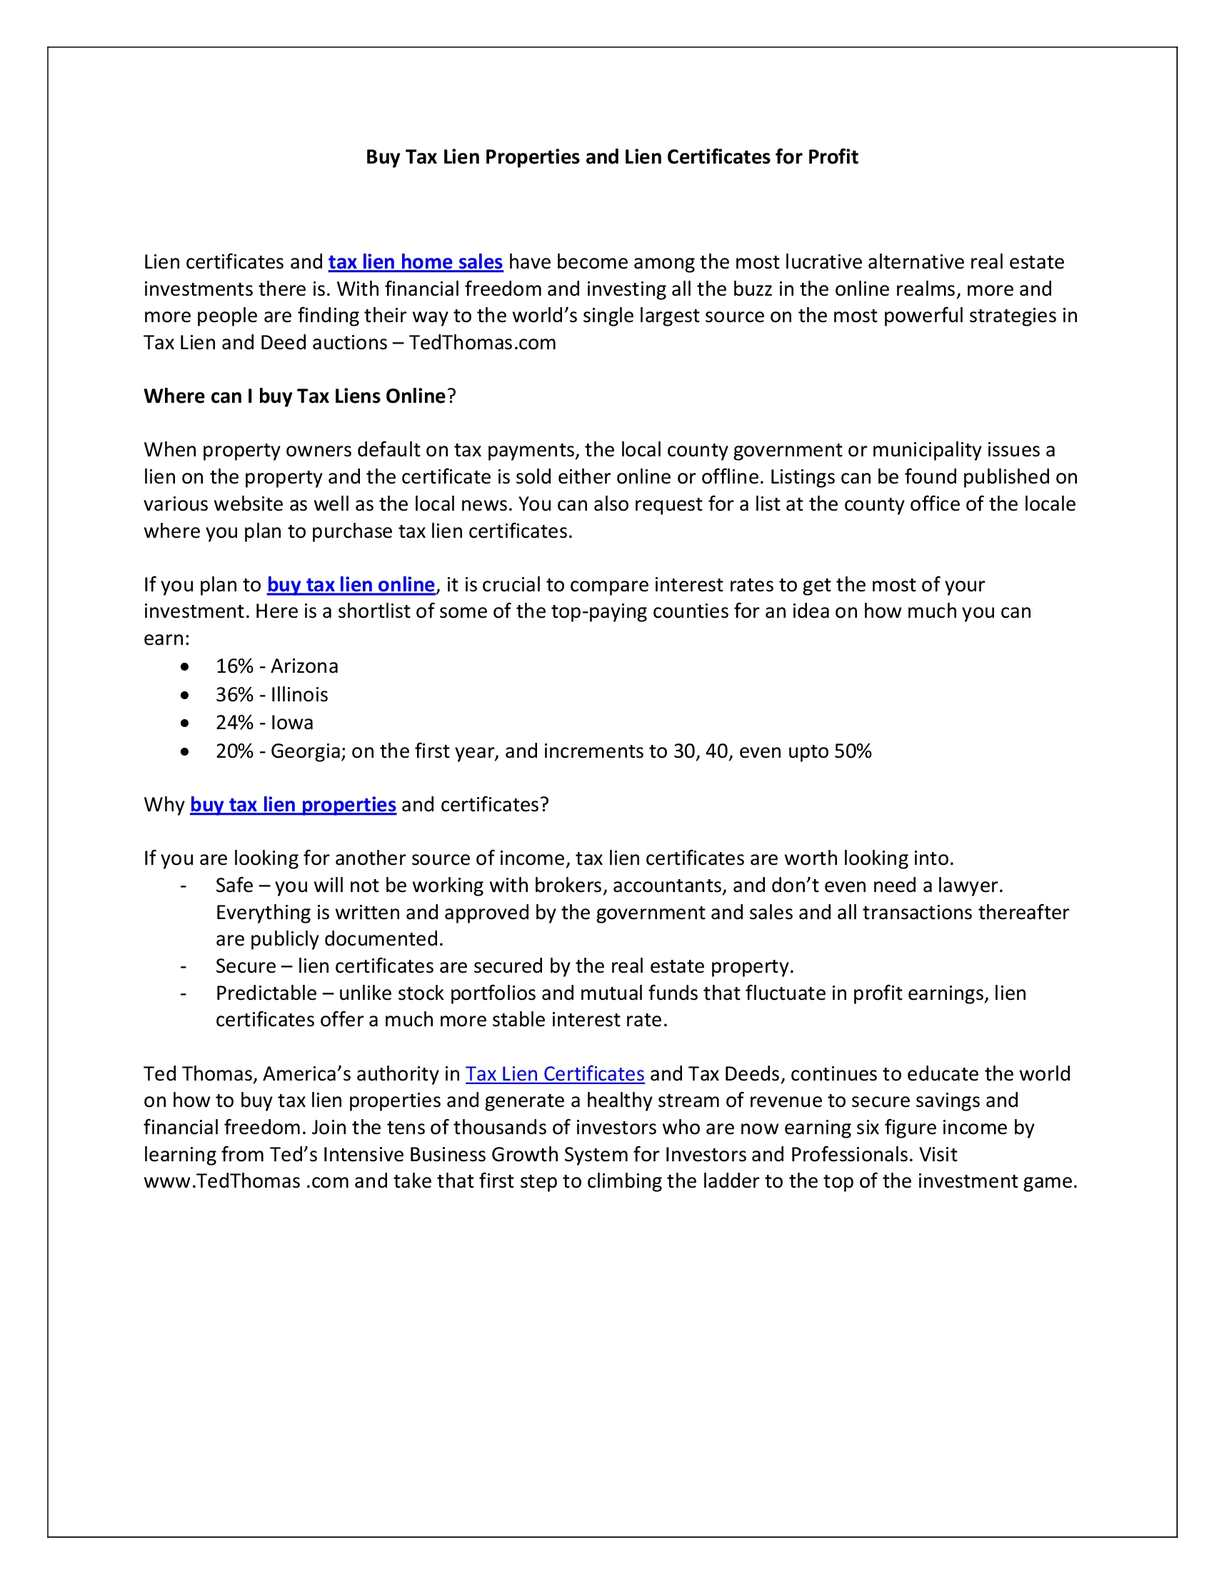 Calamo Buy Tax Lien Properties And Lien Certificates For Profit